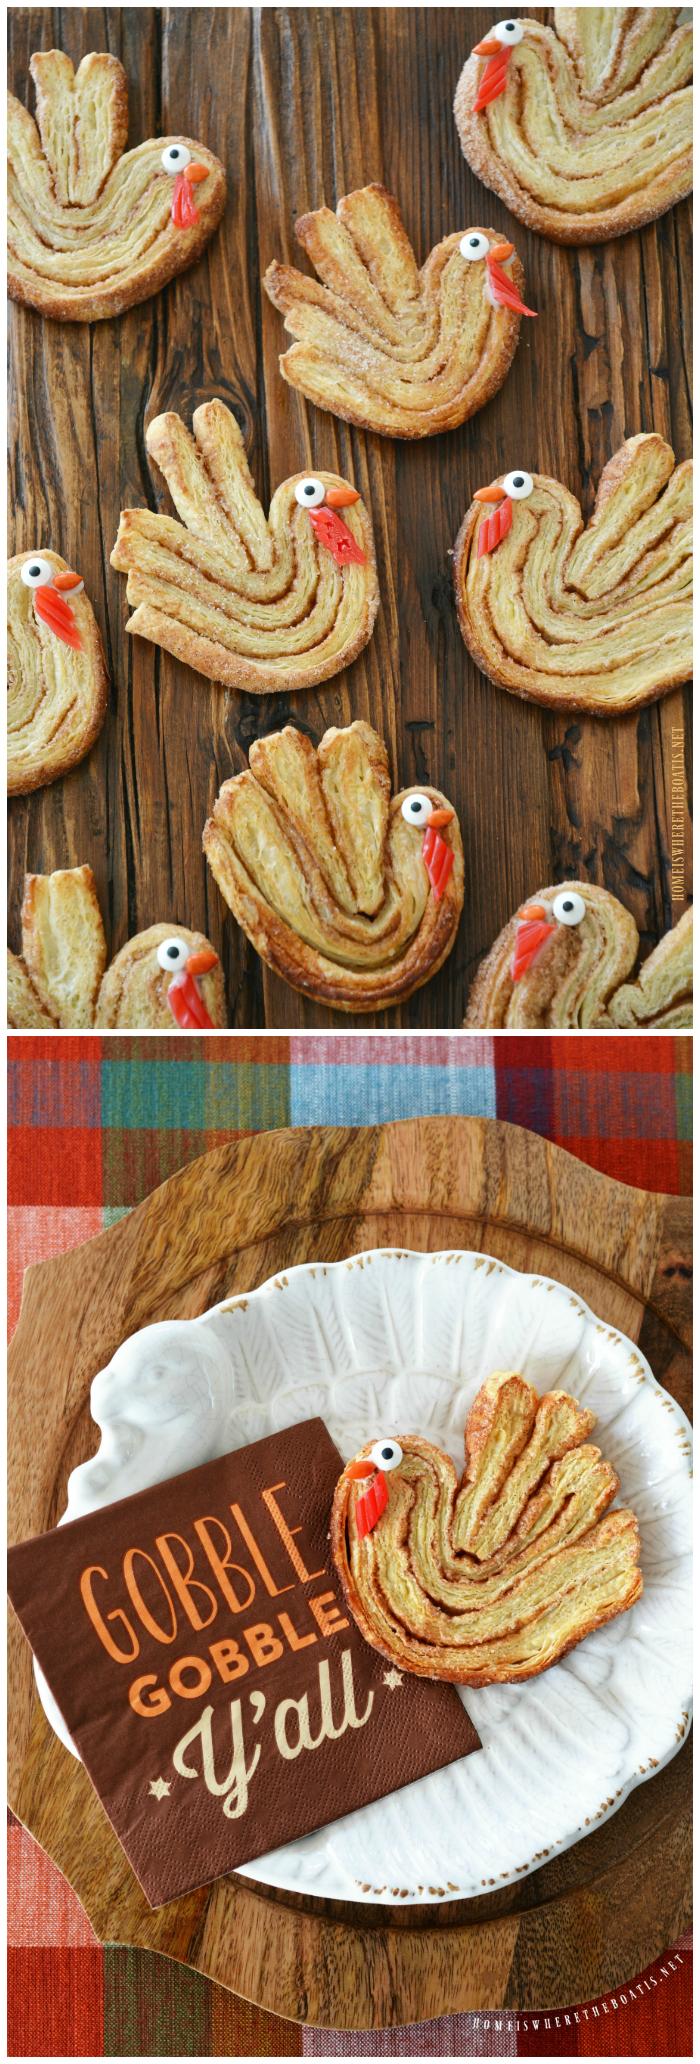 Cinnamon-Sugar Puff Pastry Turkeys! | ©homeiswheretheboatis.net #palmiers #Thanksgiving #turkey #cookies